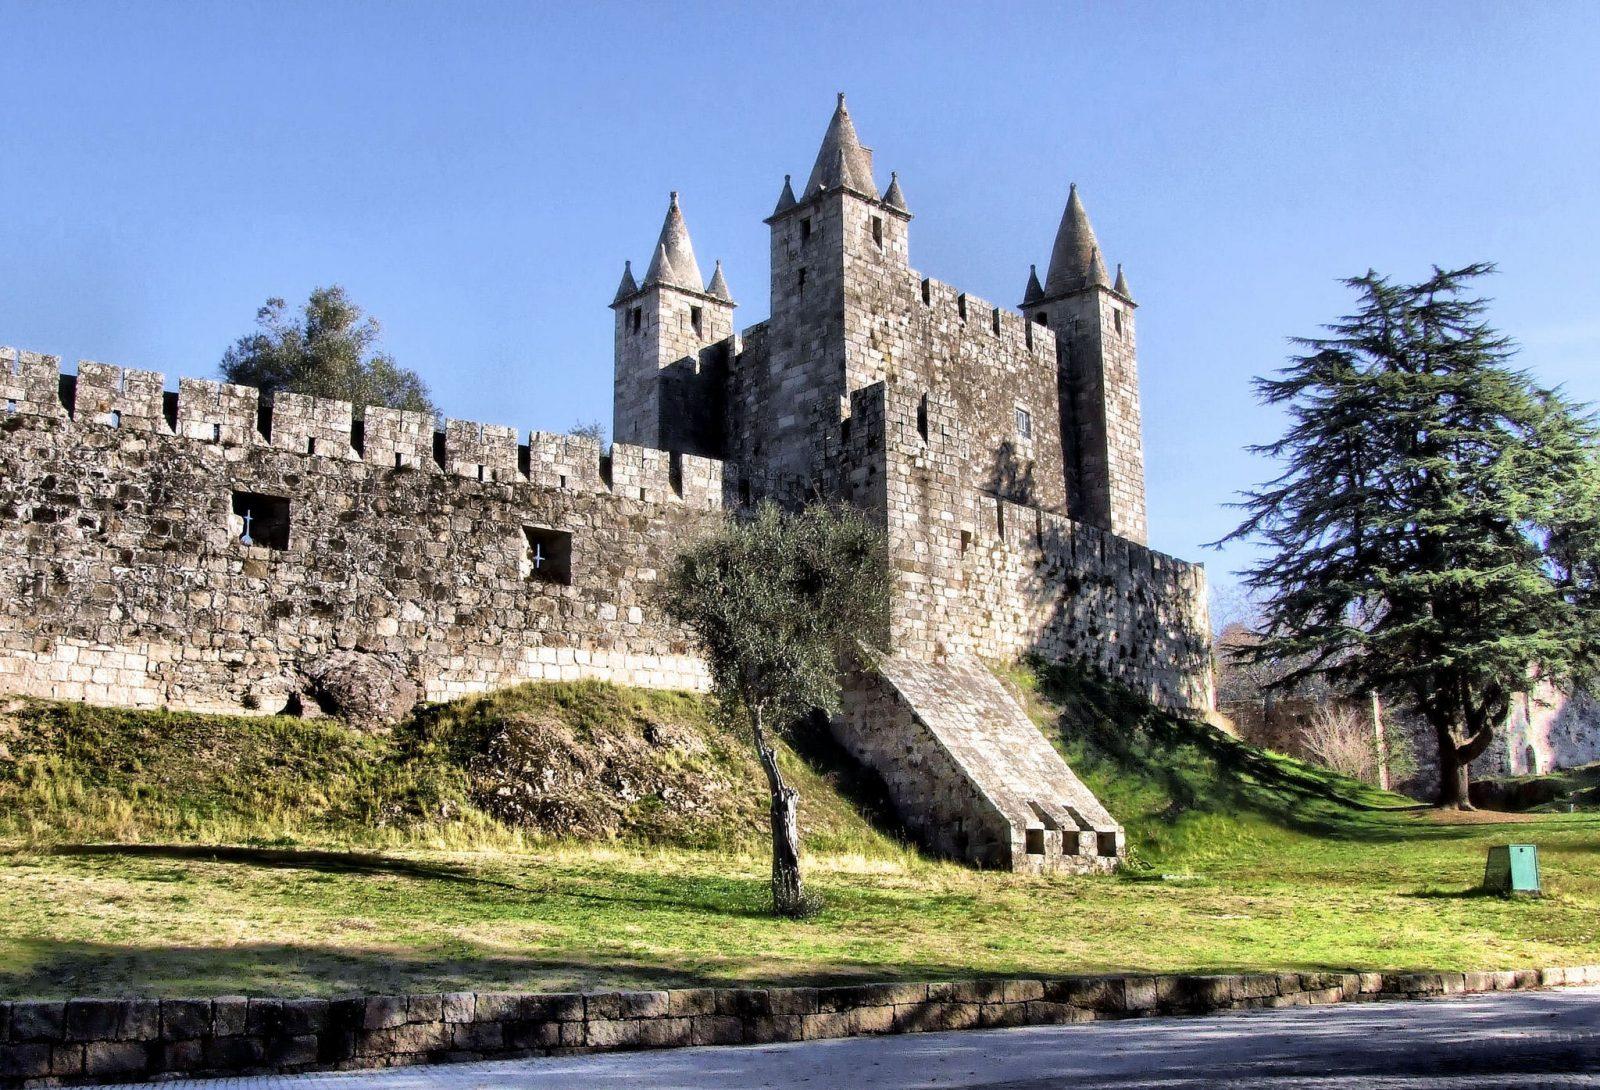 Замок Санта-Мария-да-Фейра (Castelo de Santa Maria da Feira)